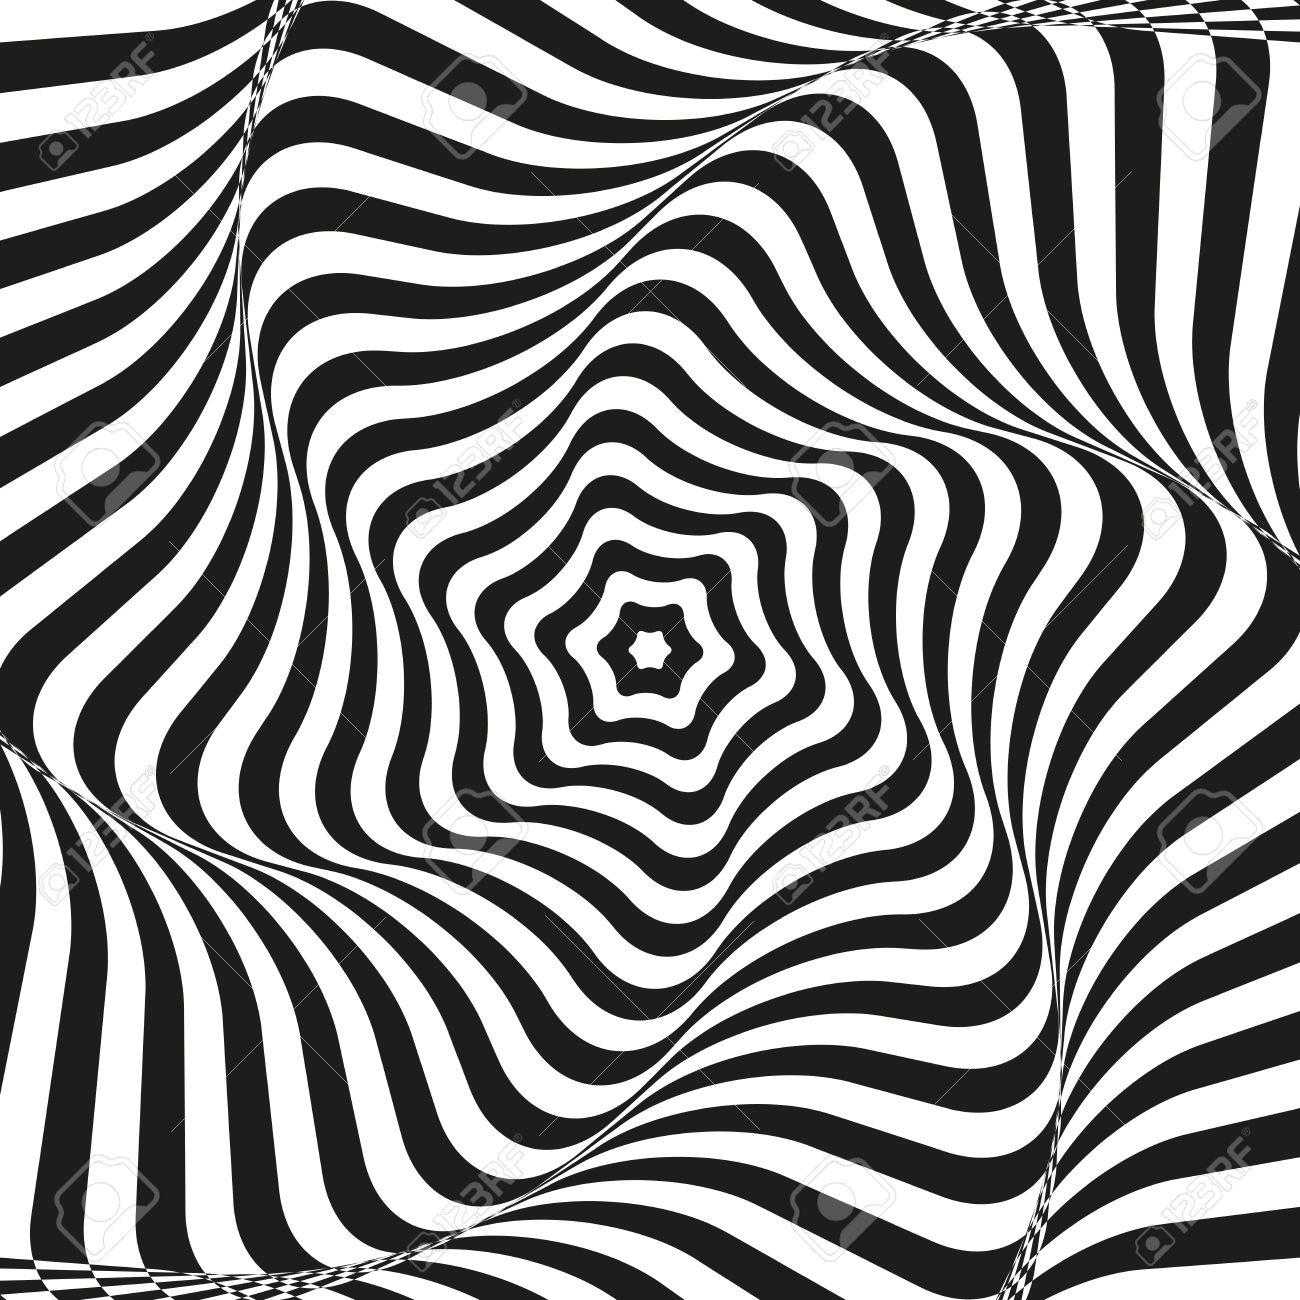 Optical Illusion Art Background Optical Illusion Black And